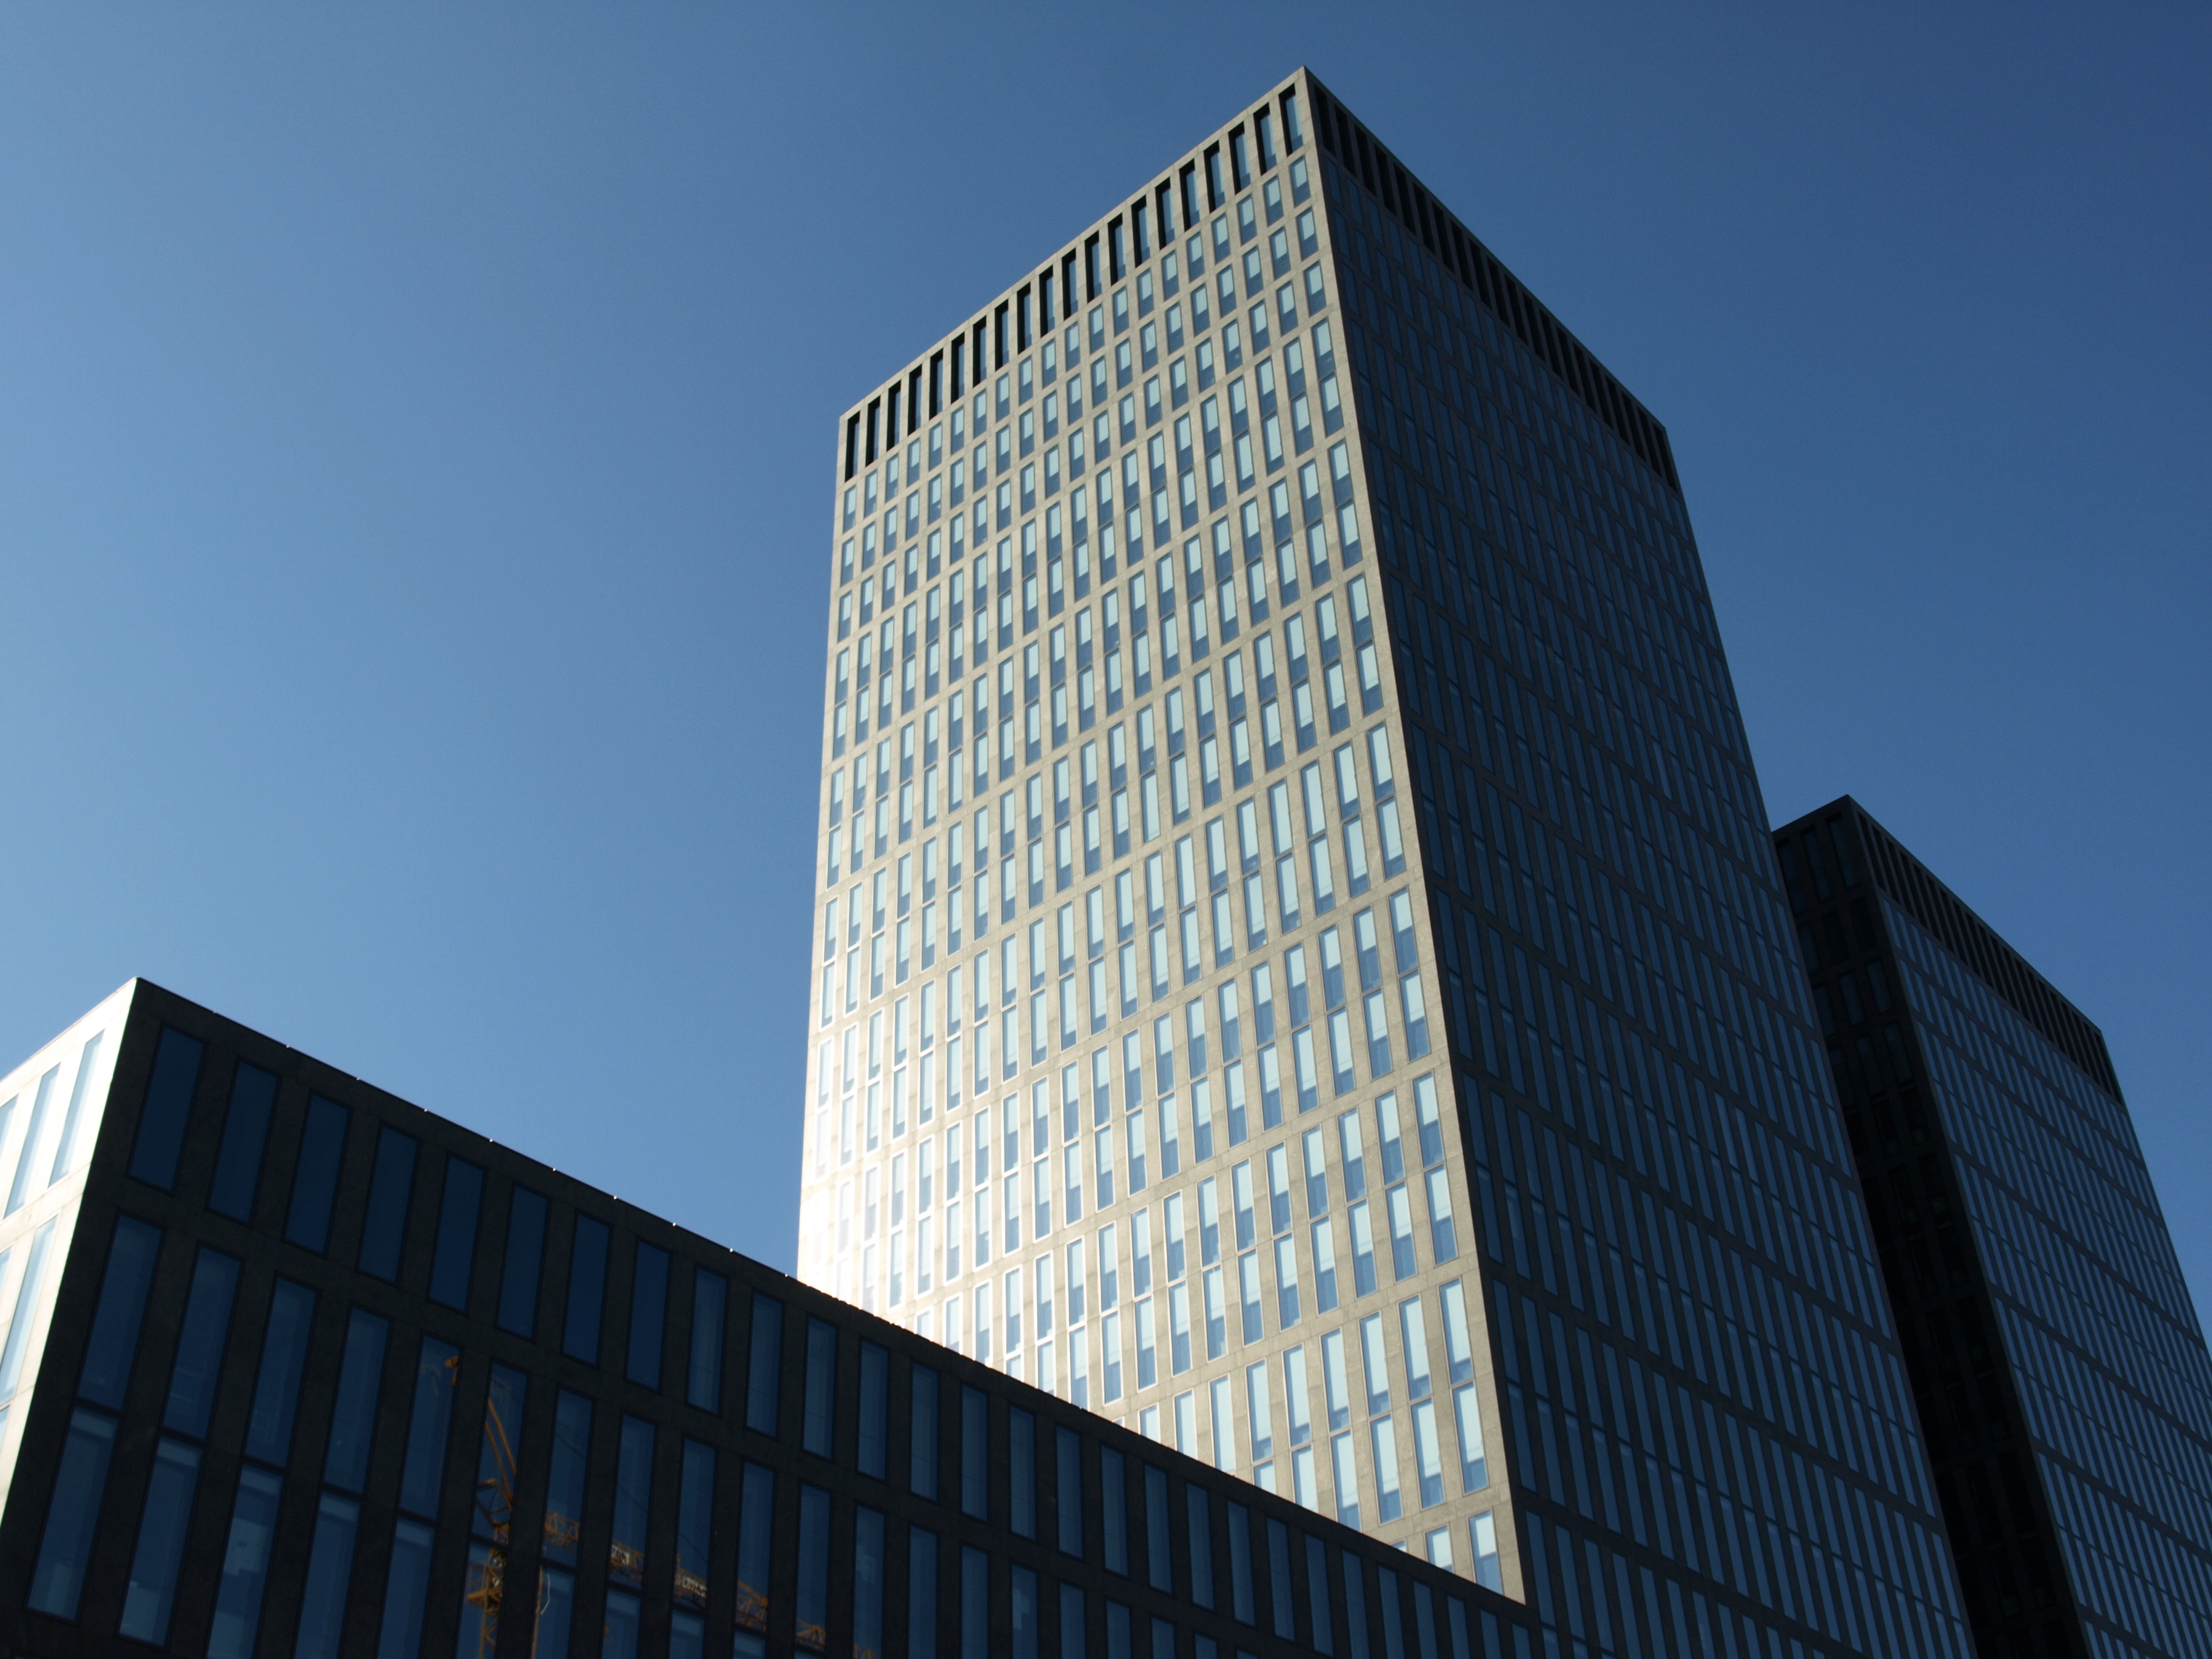 Highest Building In New York